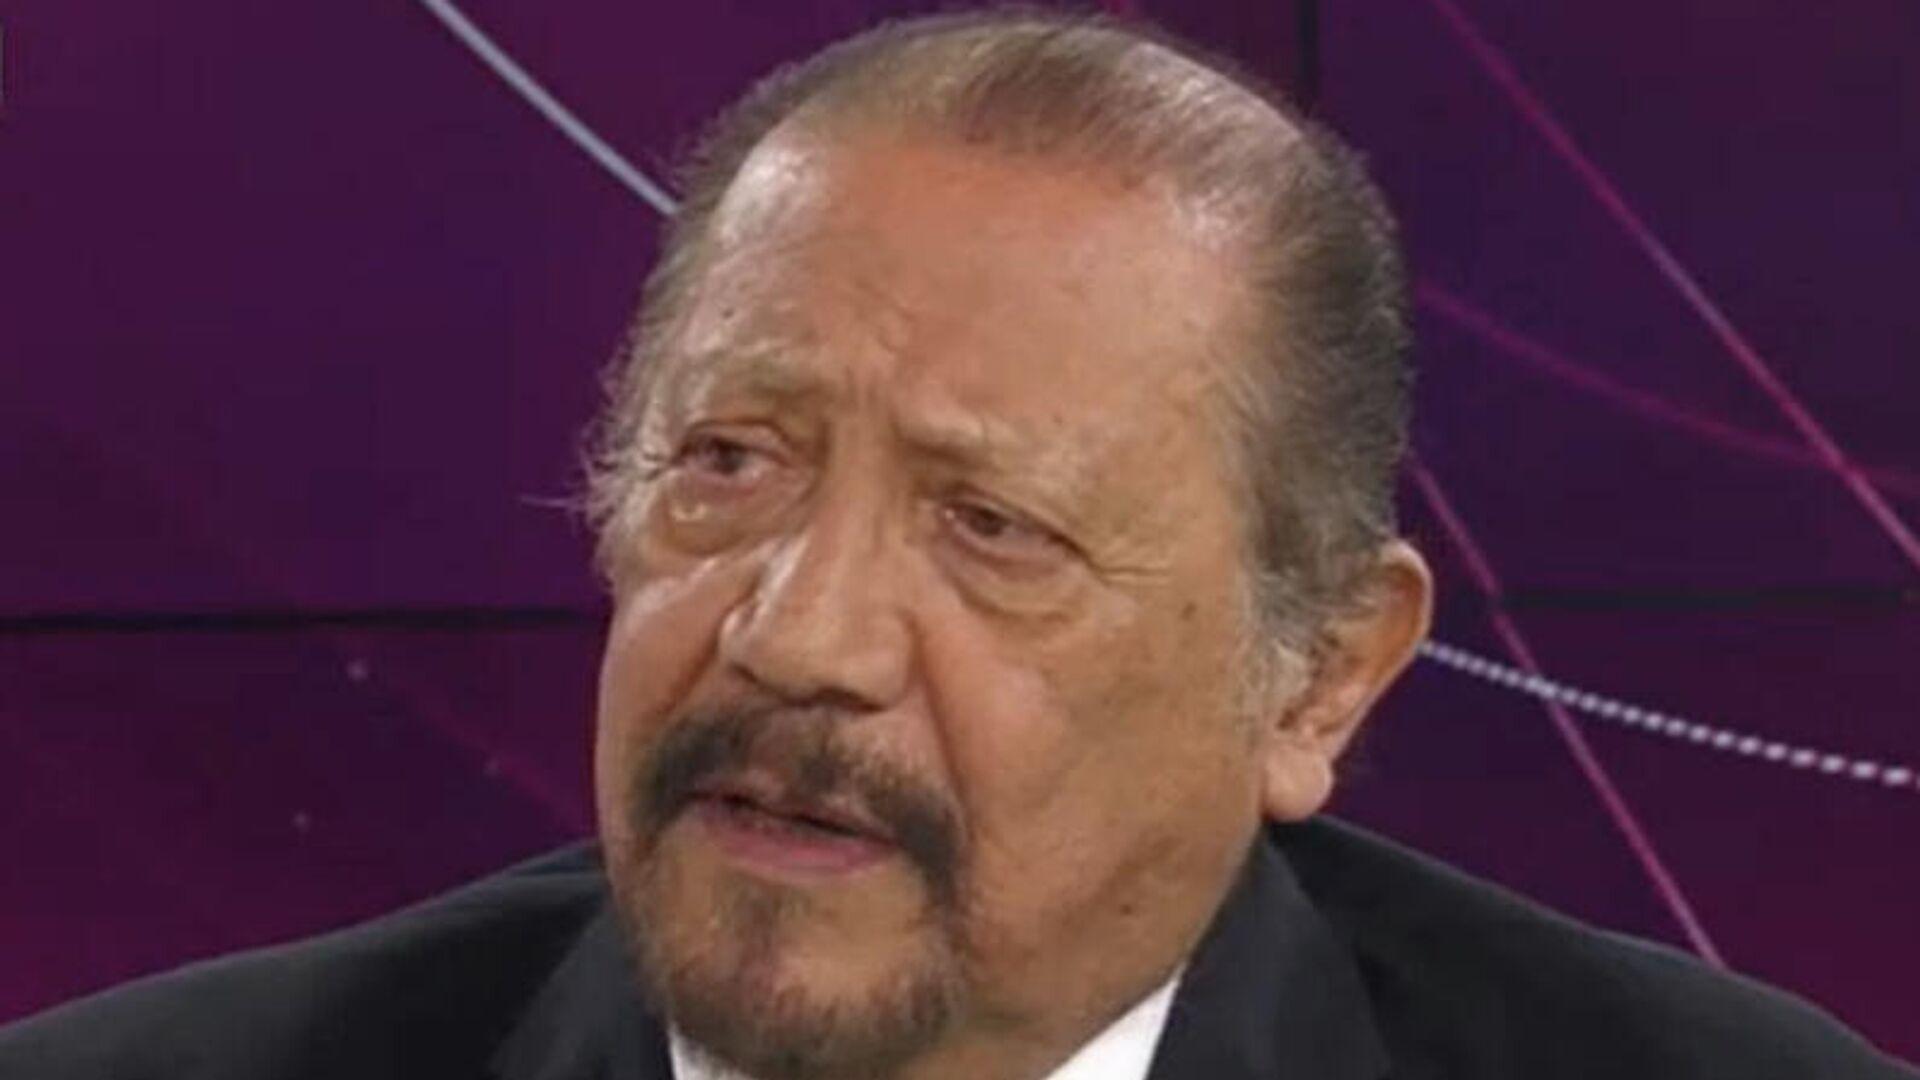 Sócrates Campos Lemus, líder del movimiento estudiantil de 1968 en México  - Sputnik Mundo, 1920, 23.09.2021